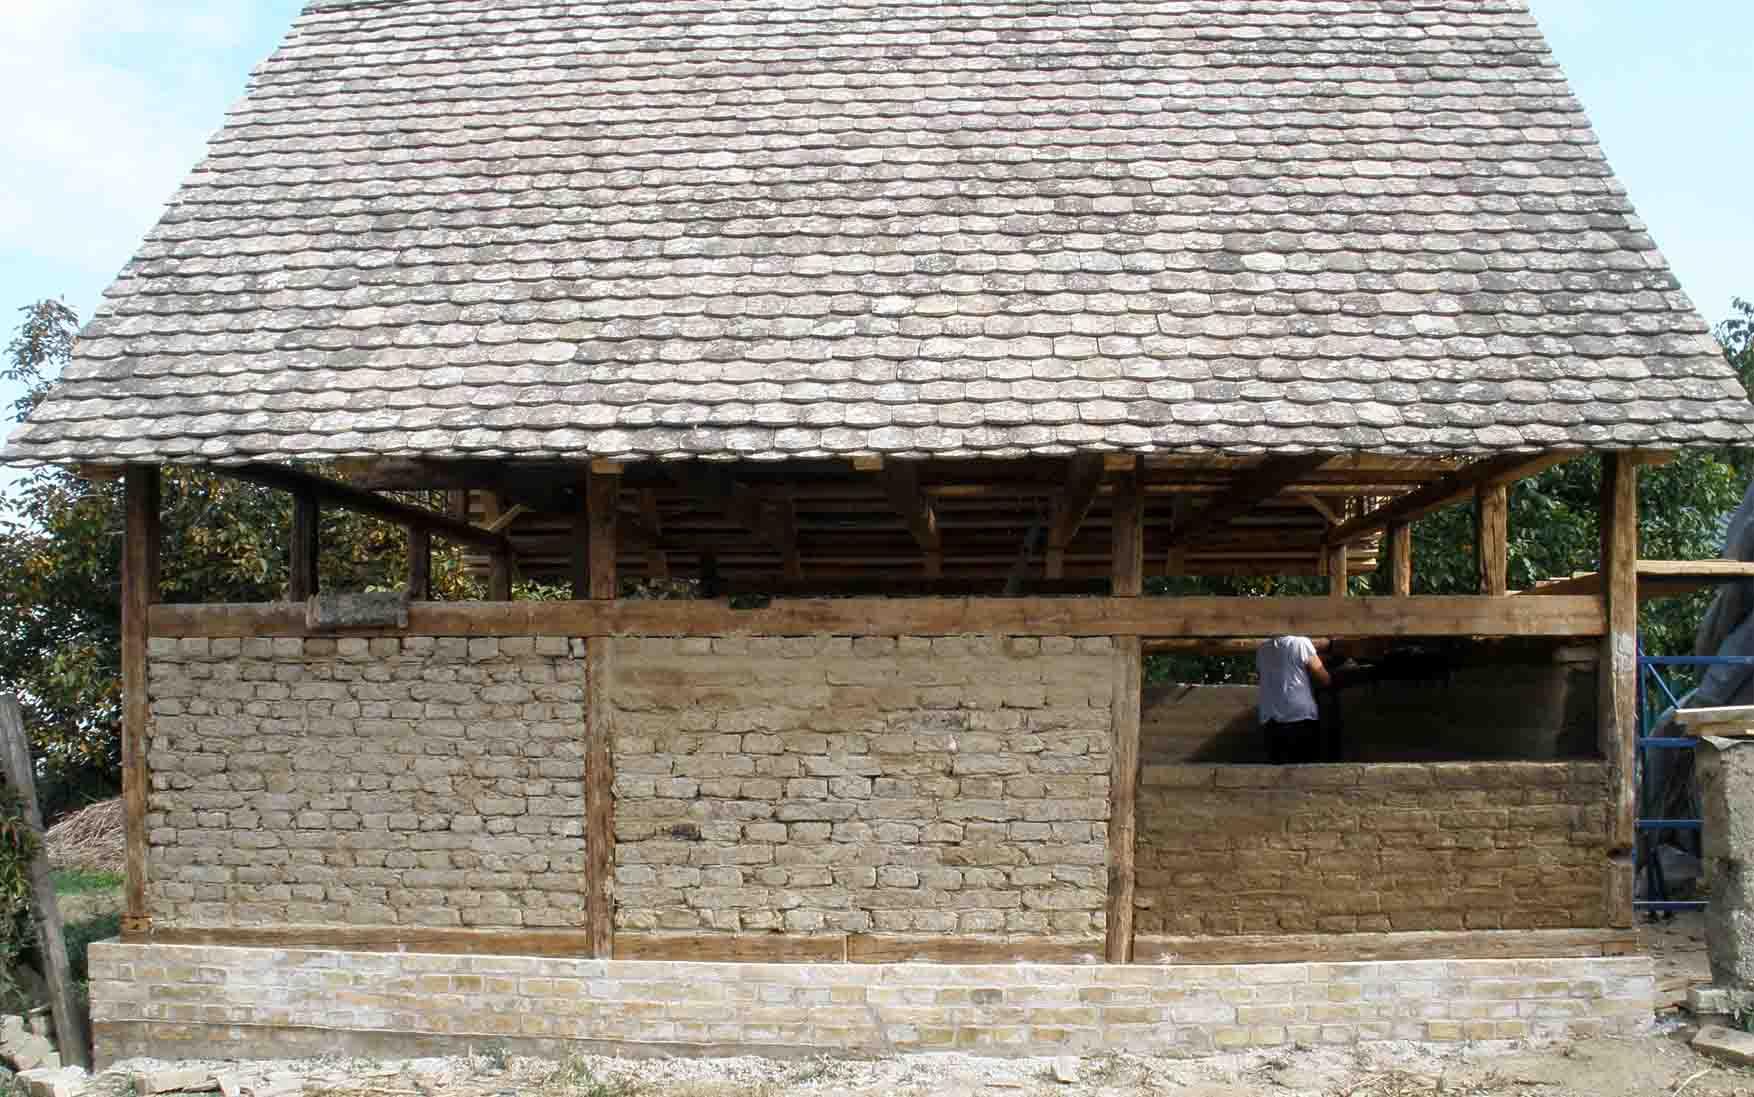 27-mora-2016-mosorin-skola-zemljane-arhitekture-cerpic